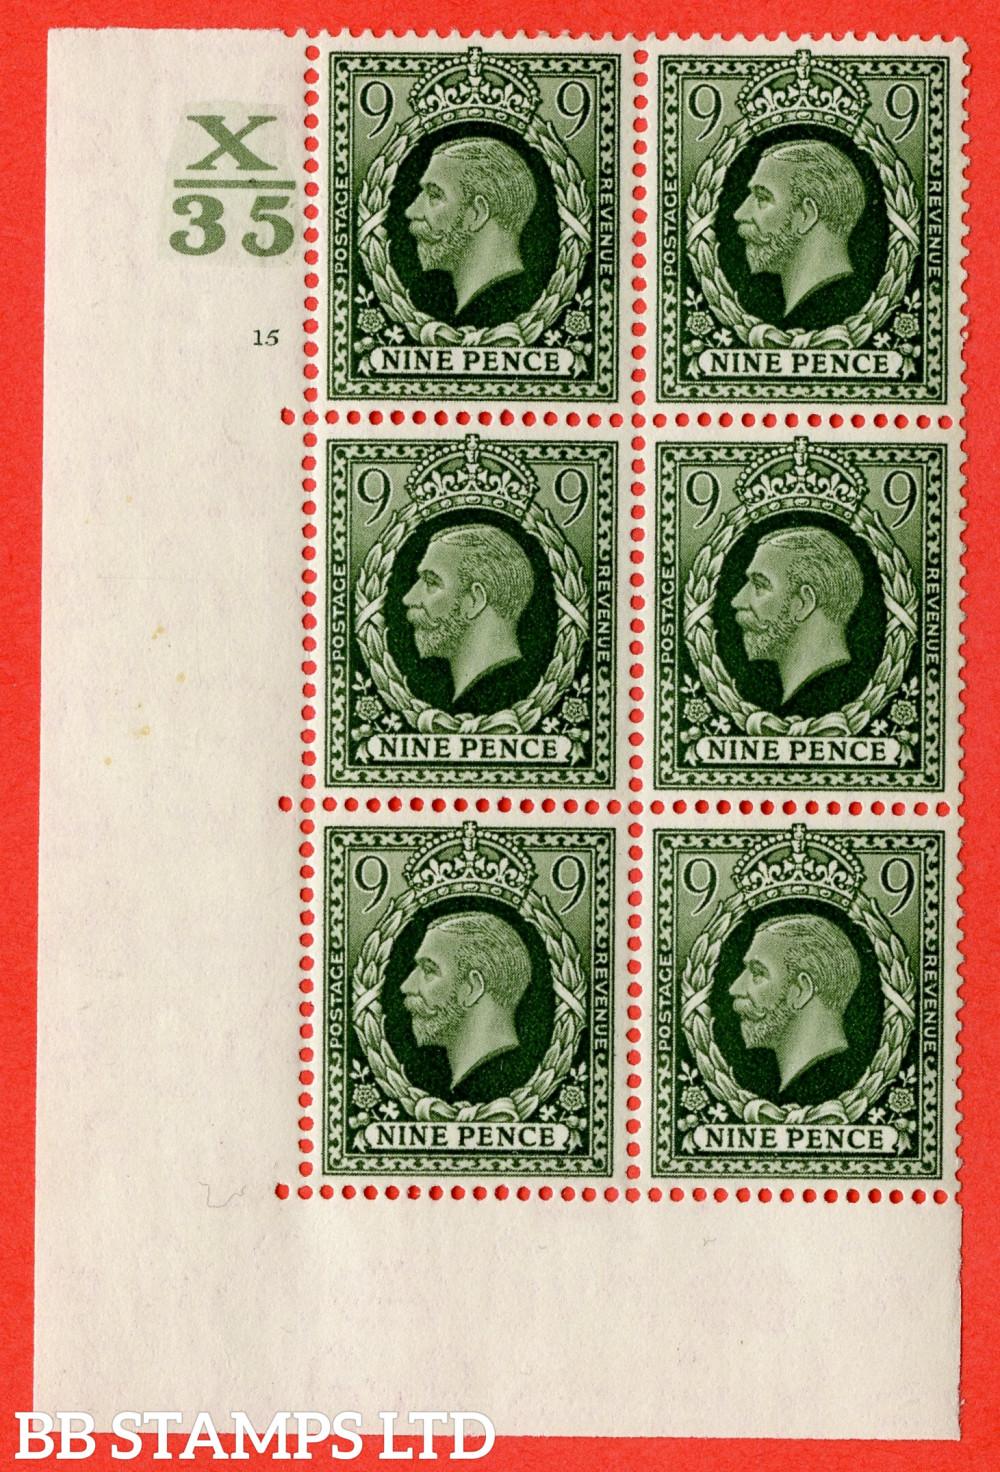 SG. 447. N60. 9d Deep Olive-Green. A fine mint block of 6. Control X35. Cylinder 15 no dot perf type 5 E/I.